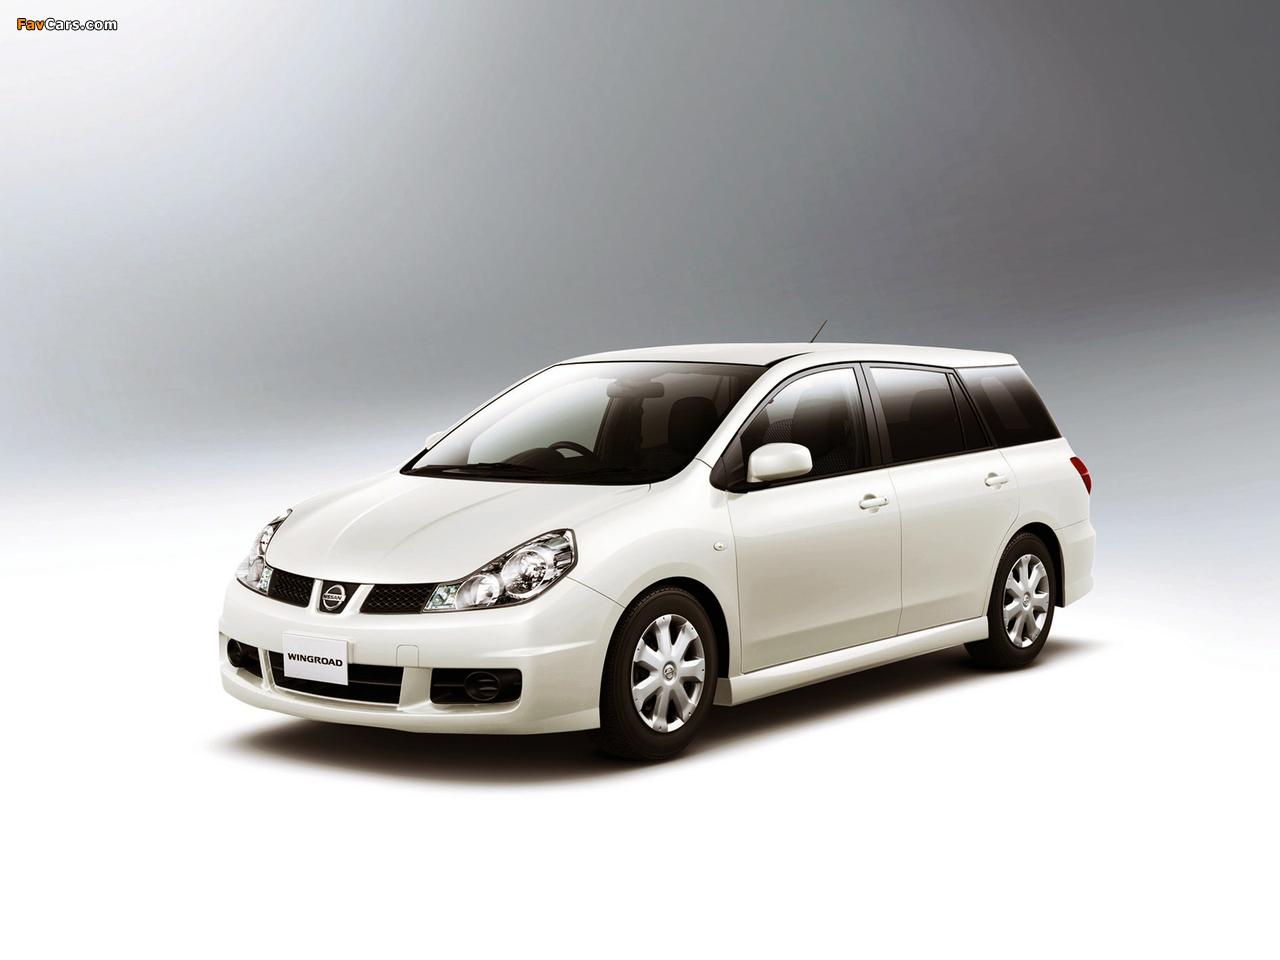 Nissan Wingroad Aero (Y12) 2005 images (1280 x 960)